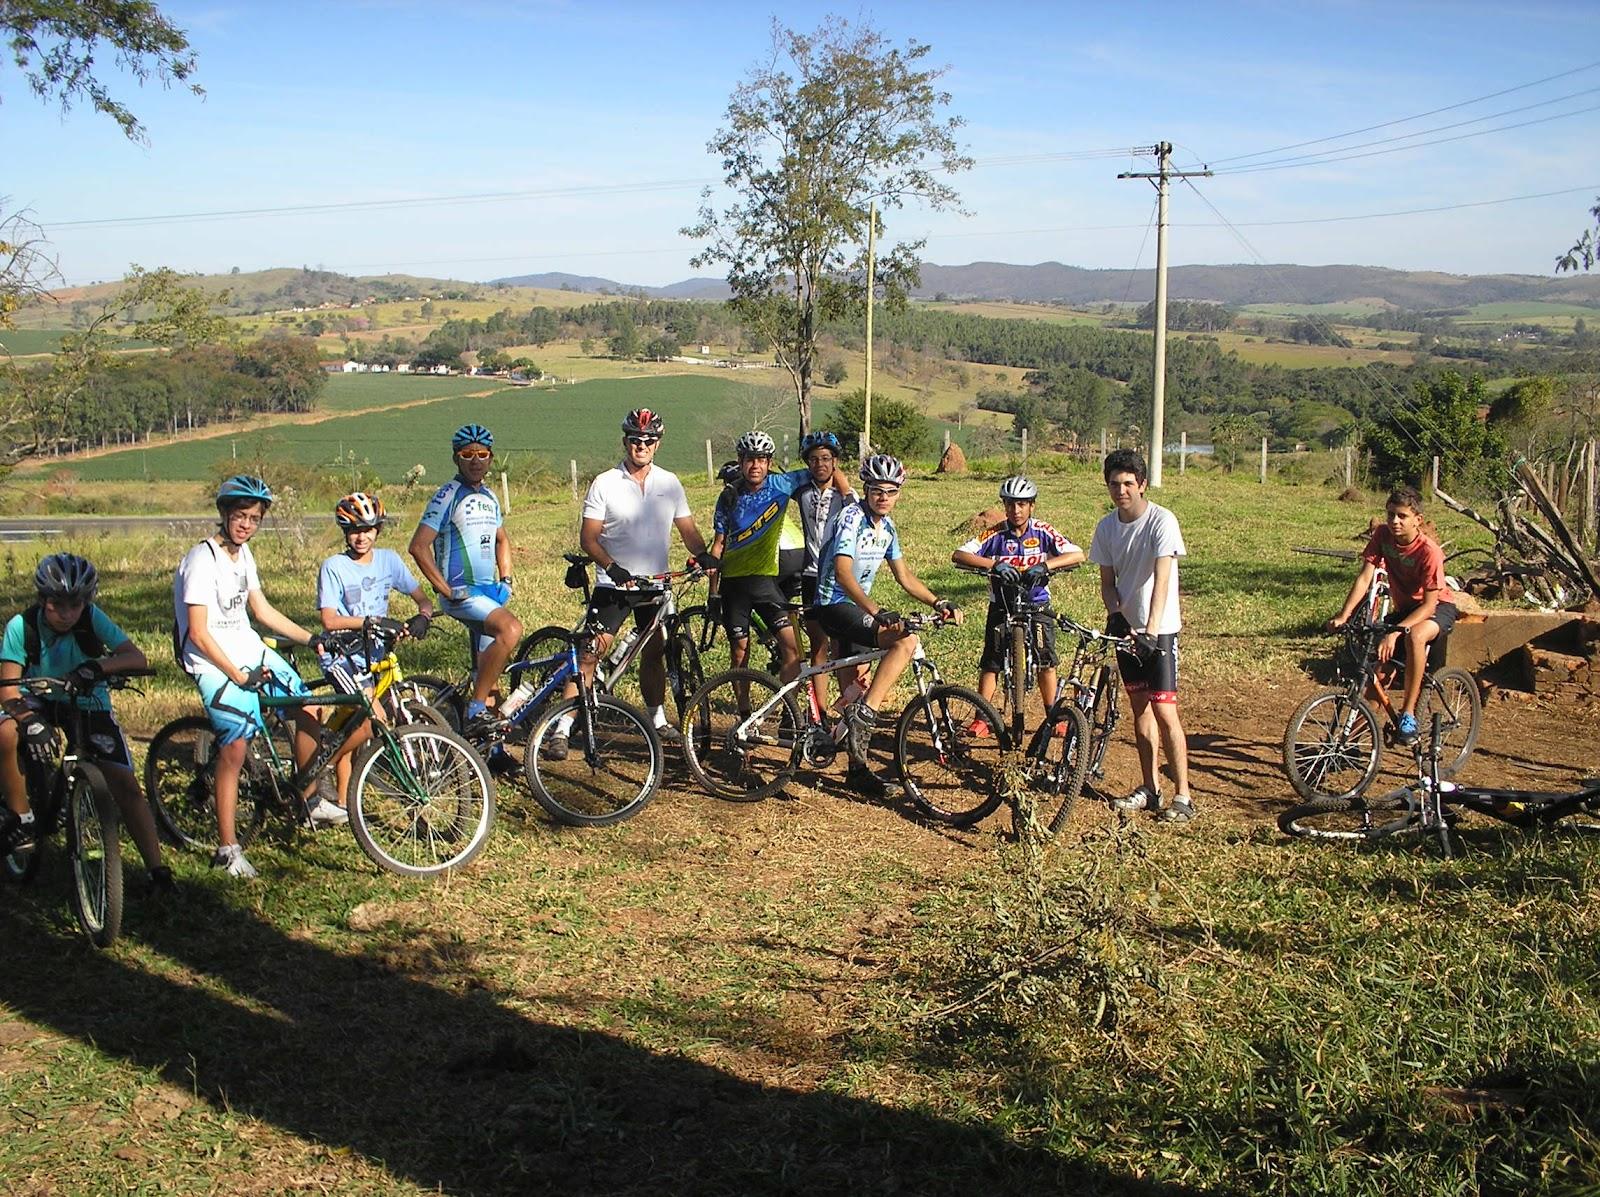 Circuito Xco : Passos mountain bike circuito xco passos e muito mountain bike no